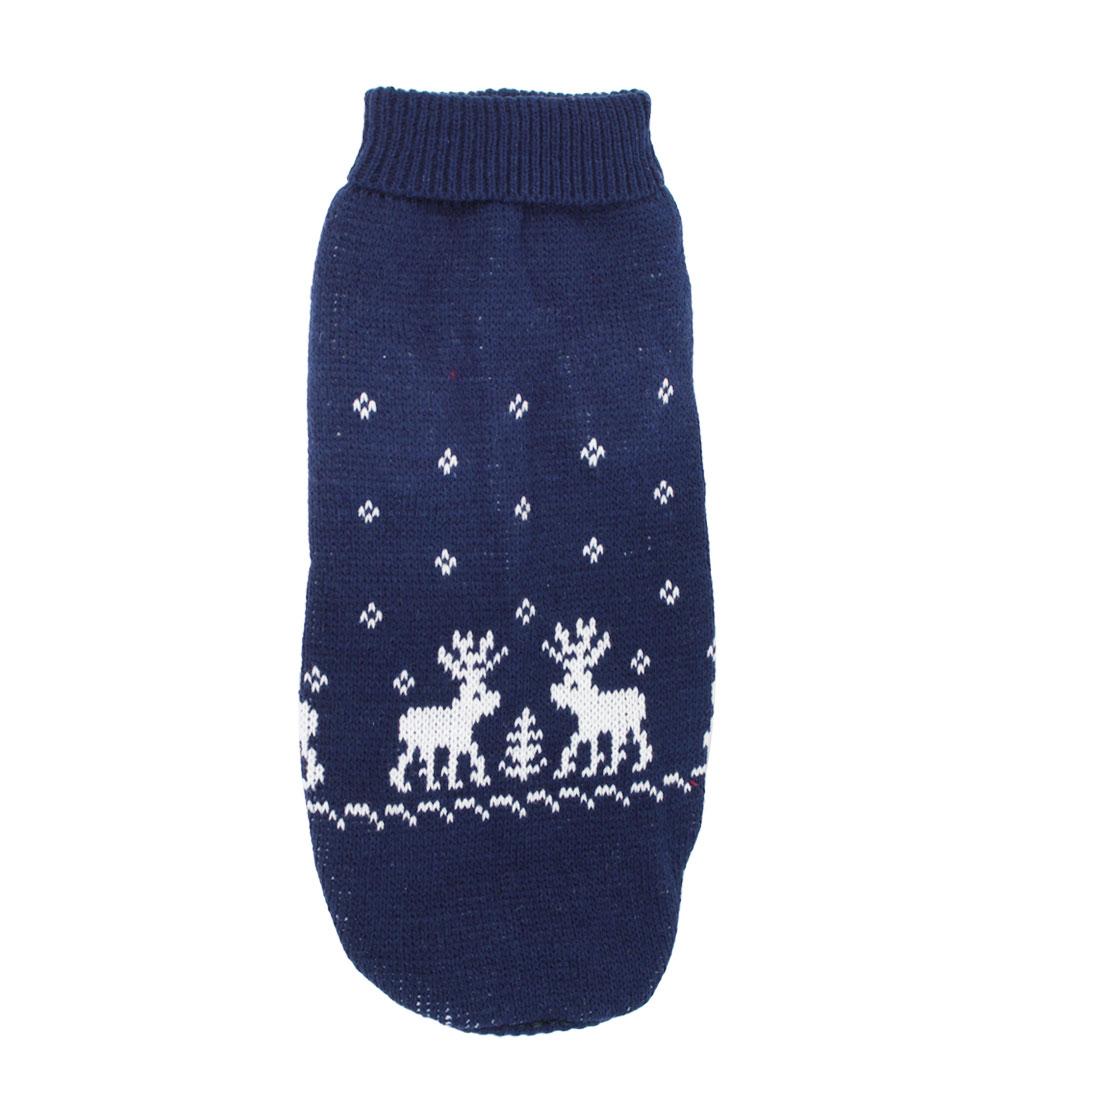 Pet Dog Puppy Ribbed Cuff Knitwear Turtleneck Apparel Sweater Dark Blue White Size M